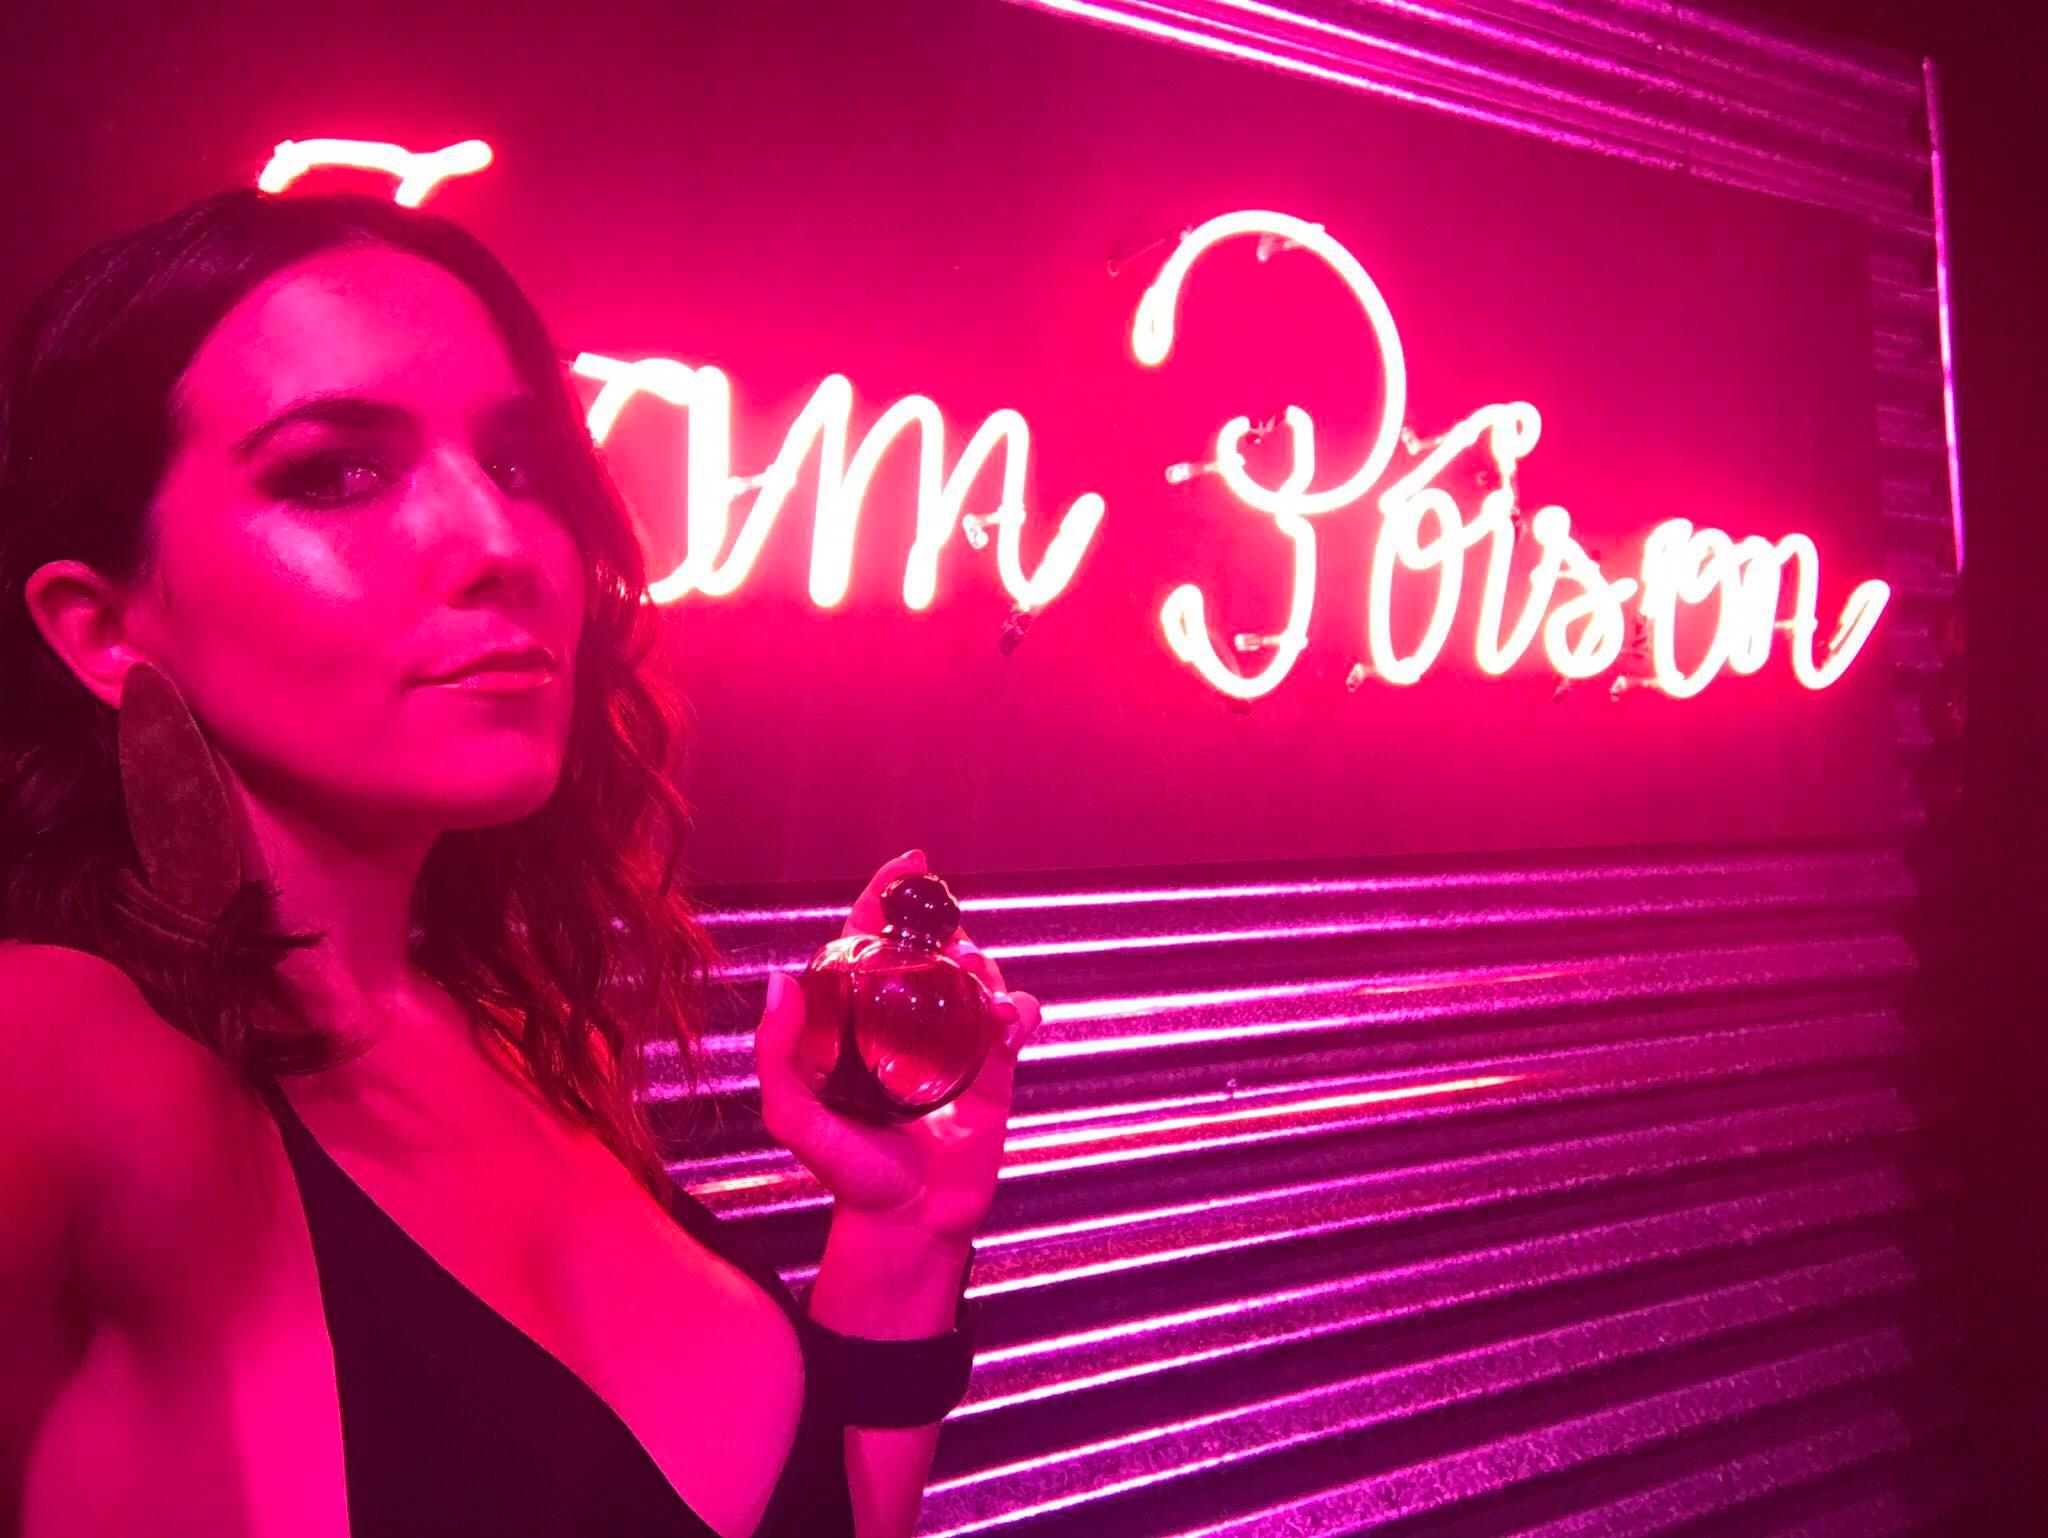 Exclusivo lanzamiento de Poison Girl de Dior en BA